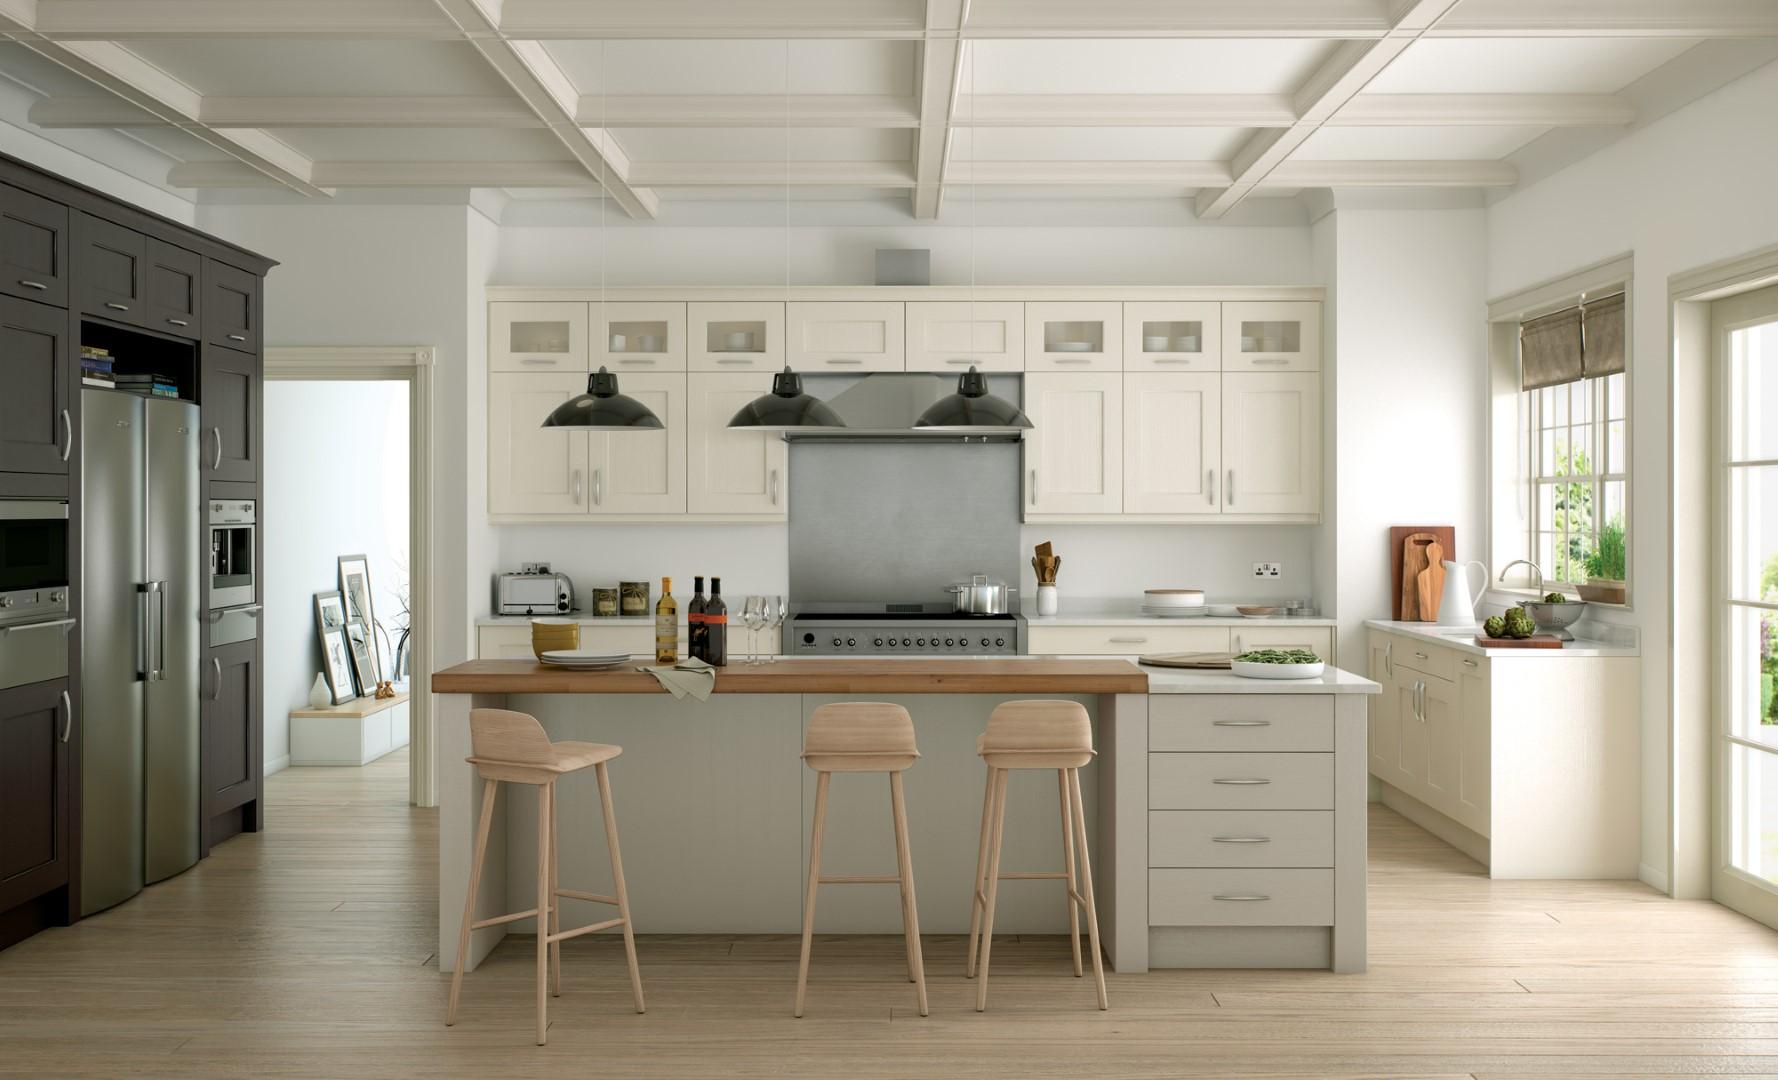 Wakefield Painted Ivory Stone Lava Kitchen - Kitchen Design - Alan Kelly Kitchens - Waterford